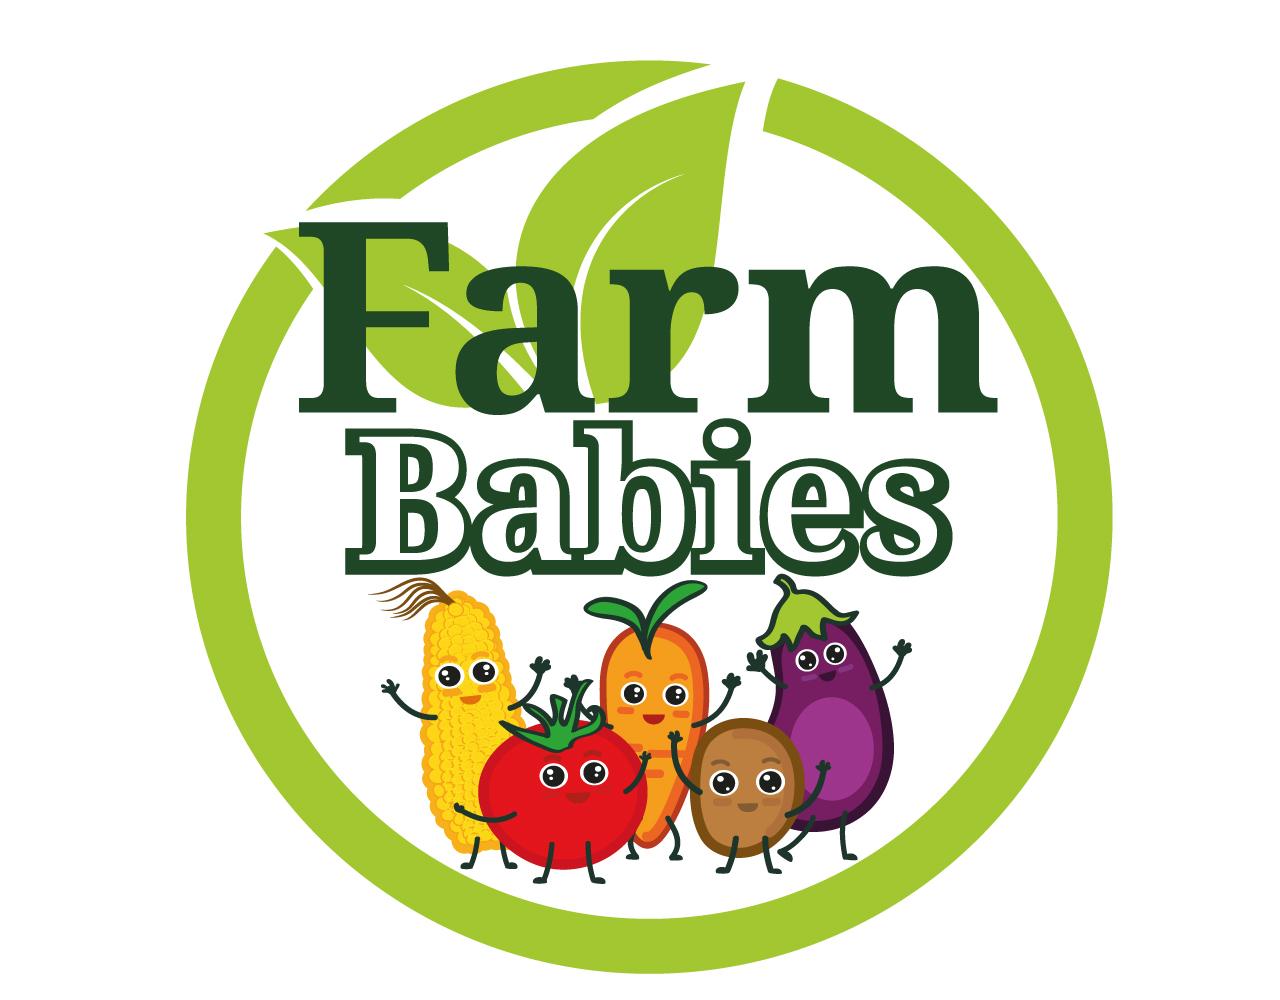 Micro-greens/vegetable farm Logo by pictaya